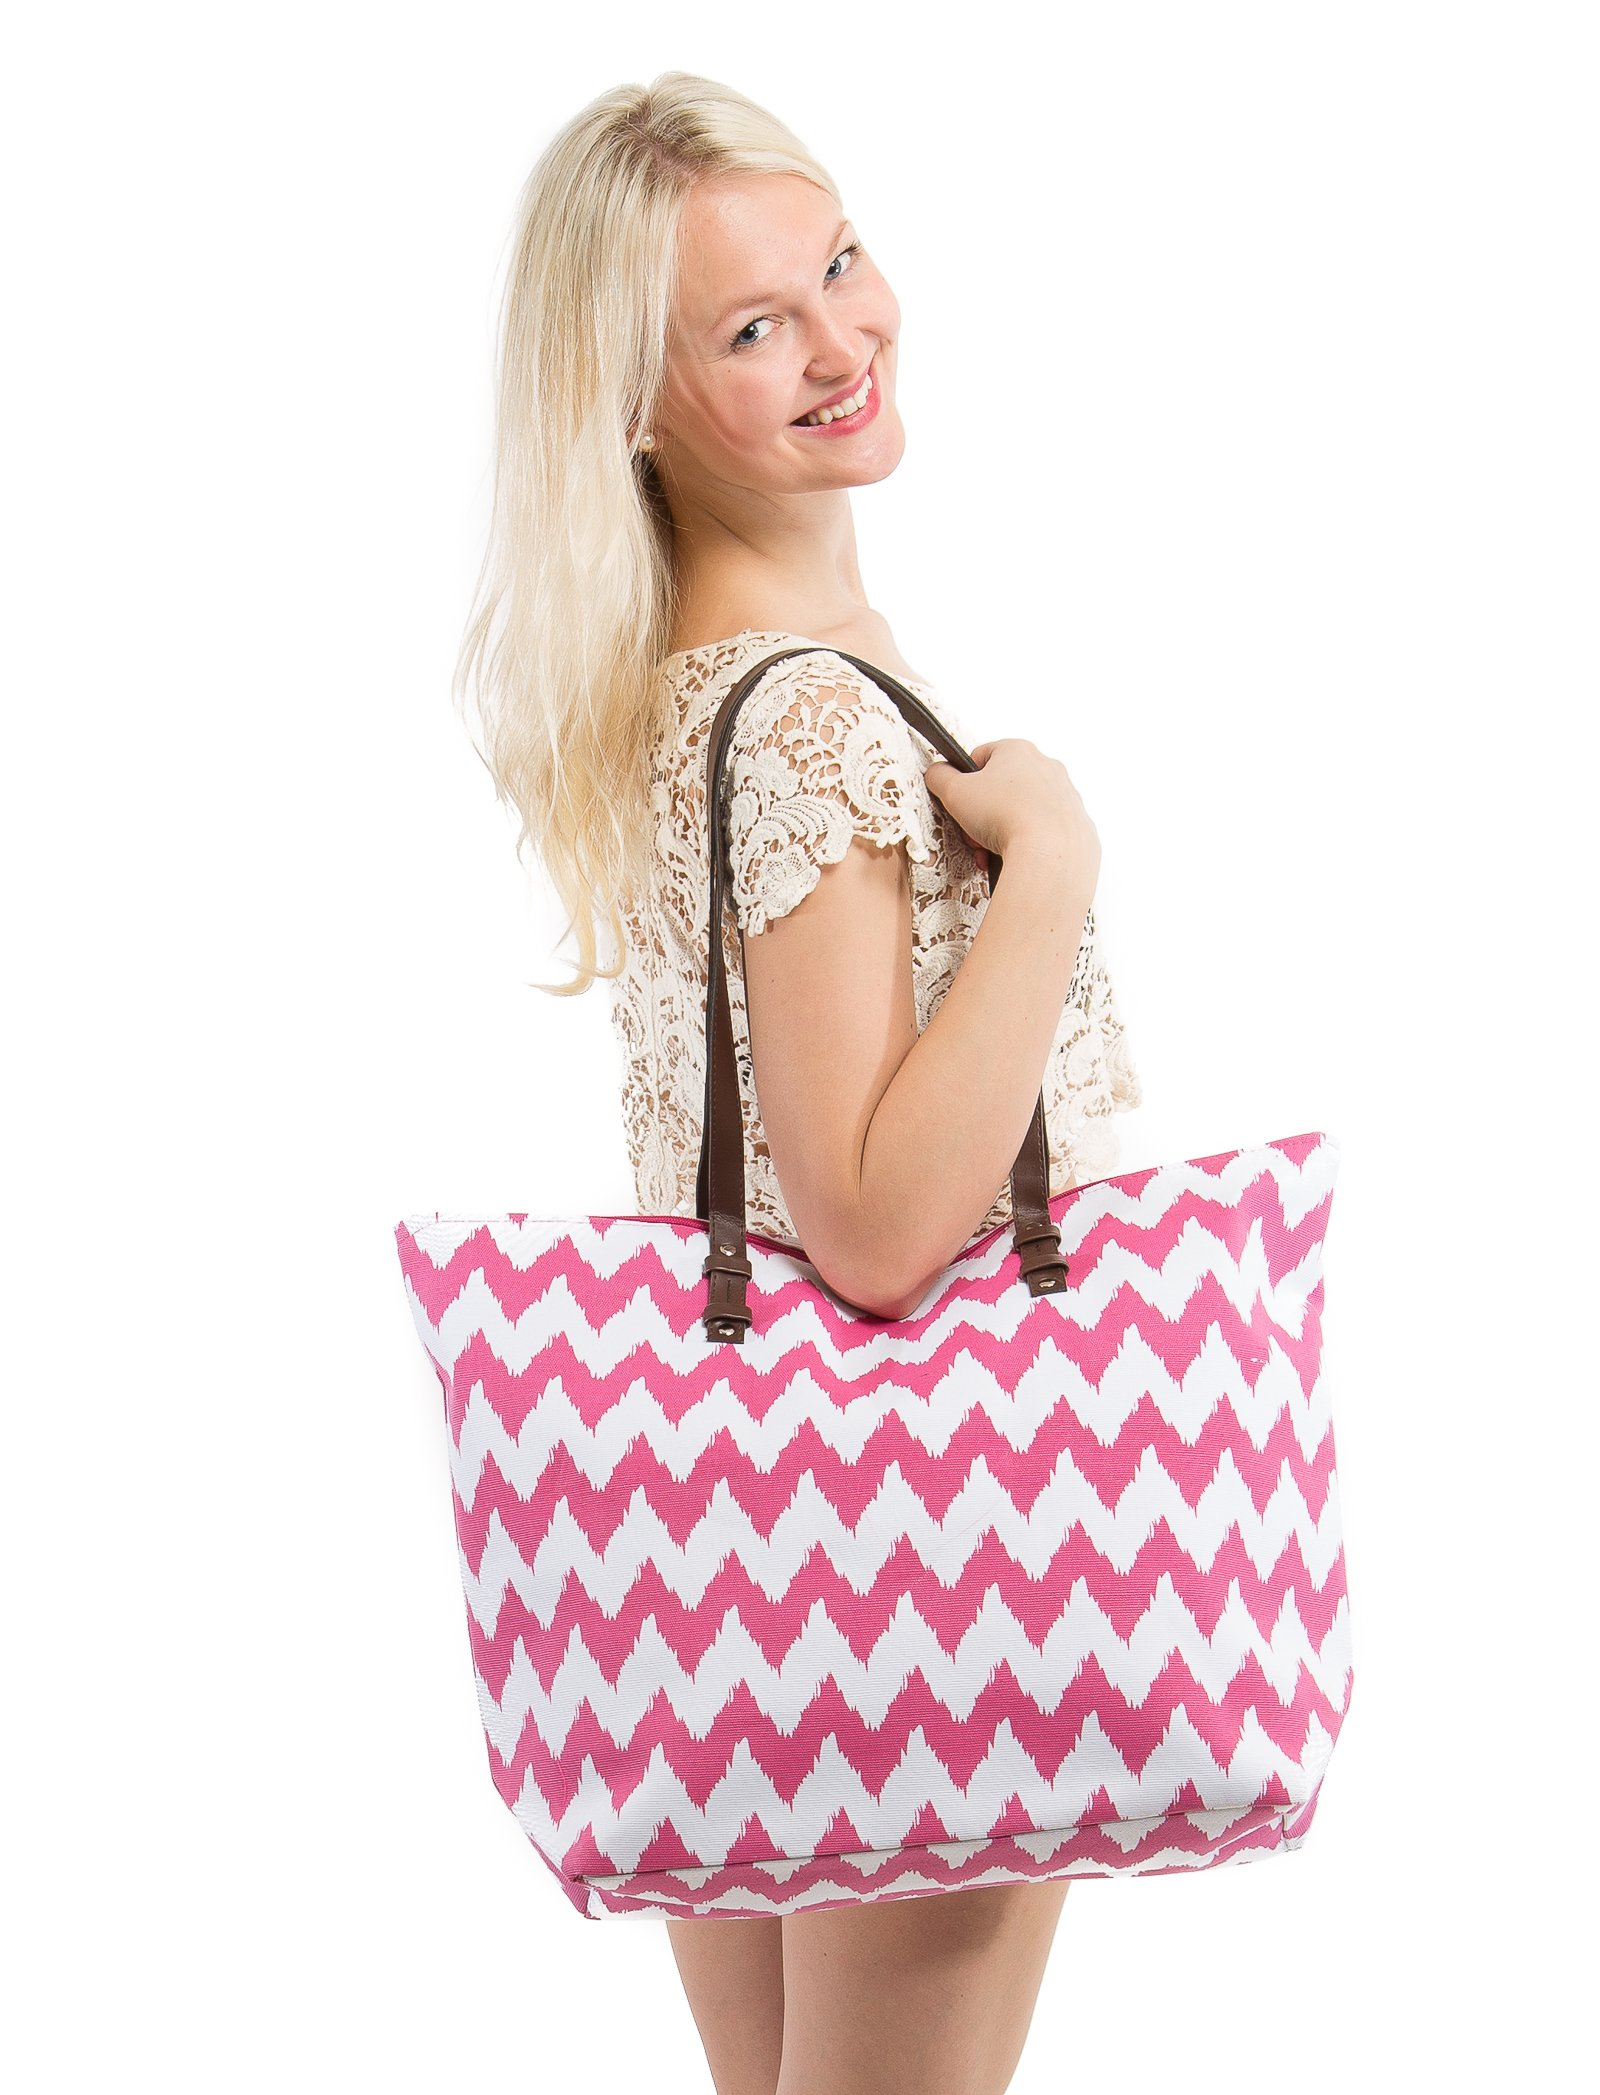 X-Large Chevron Print Canvas Beach Bag Tote - 22''x15''x6'' (Pink Chevron)